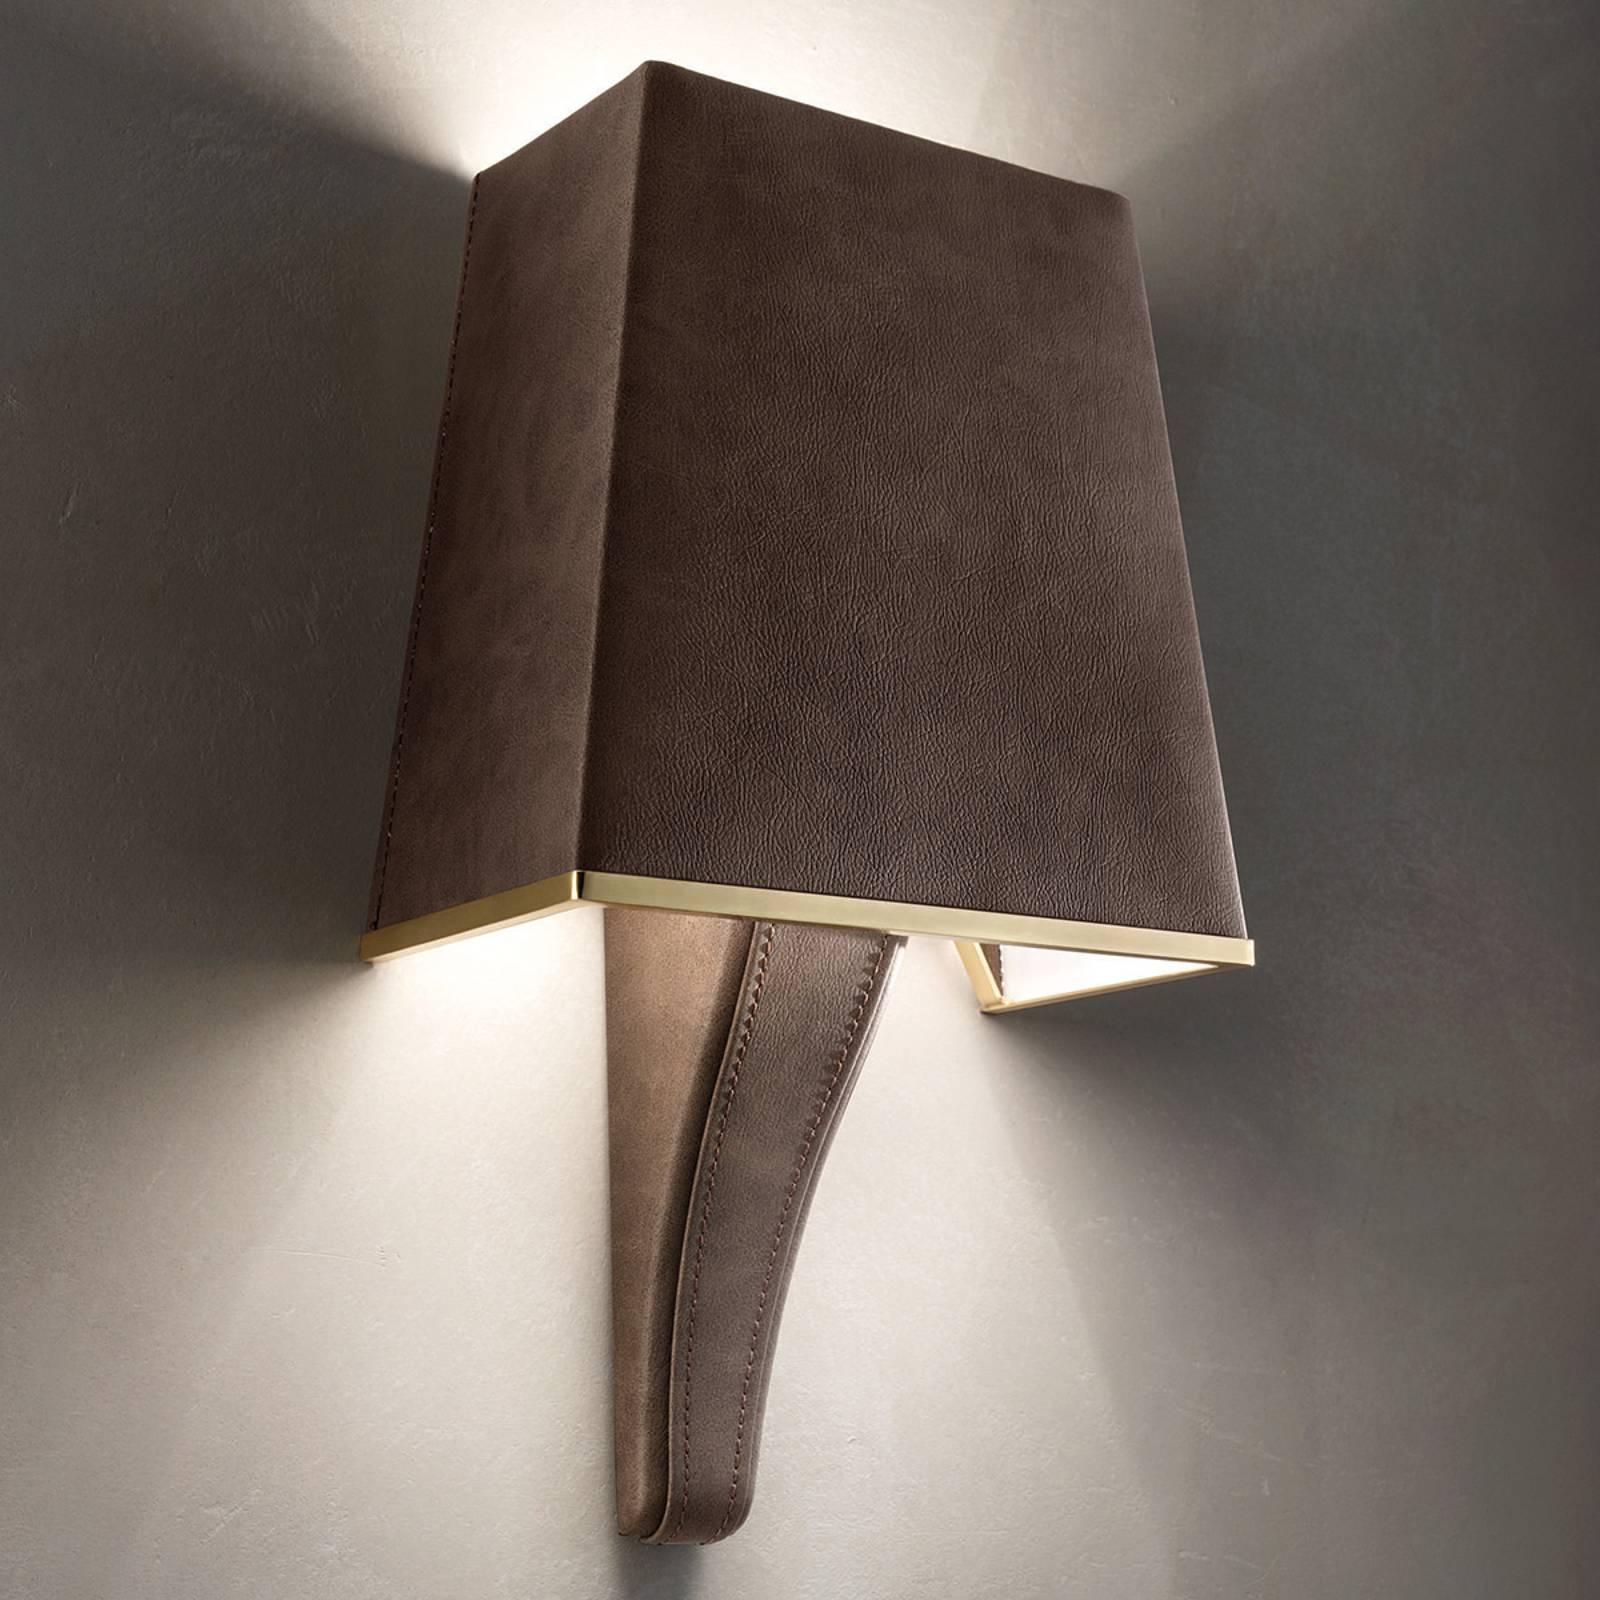 Wandlamp Darshan met kap en leren overtrek